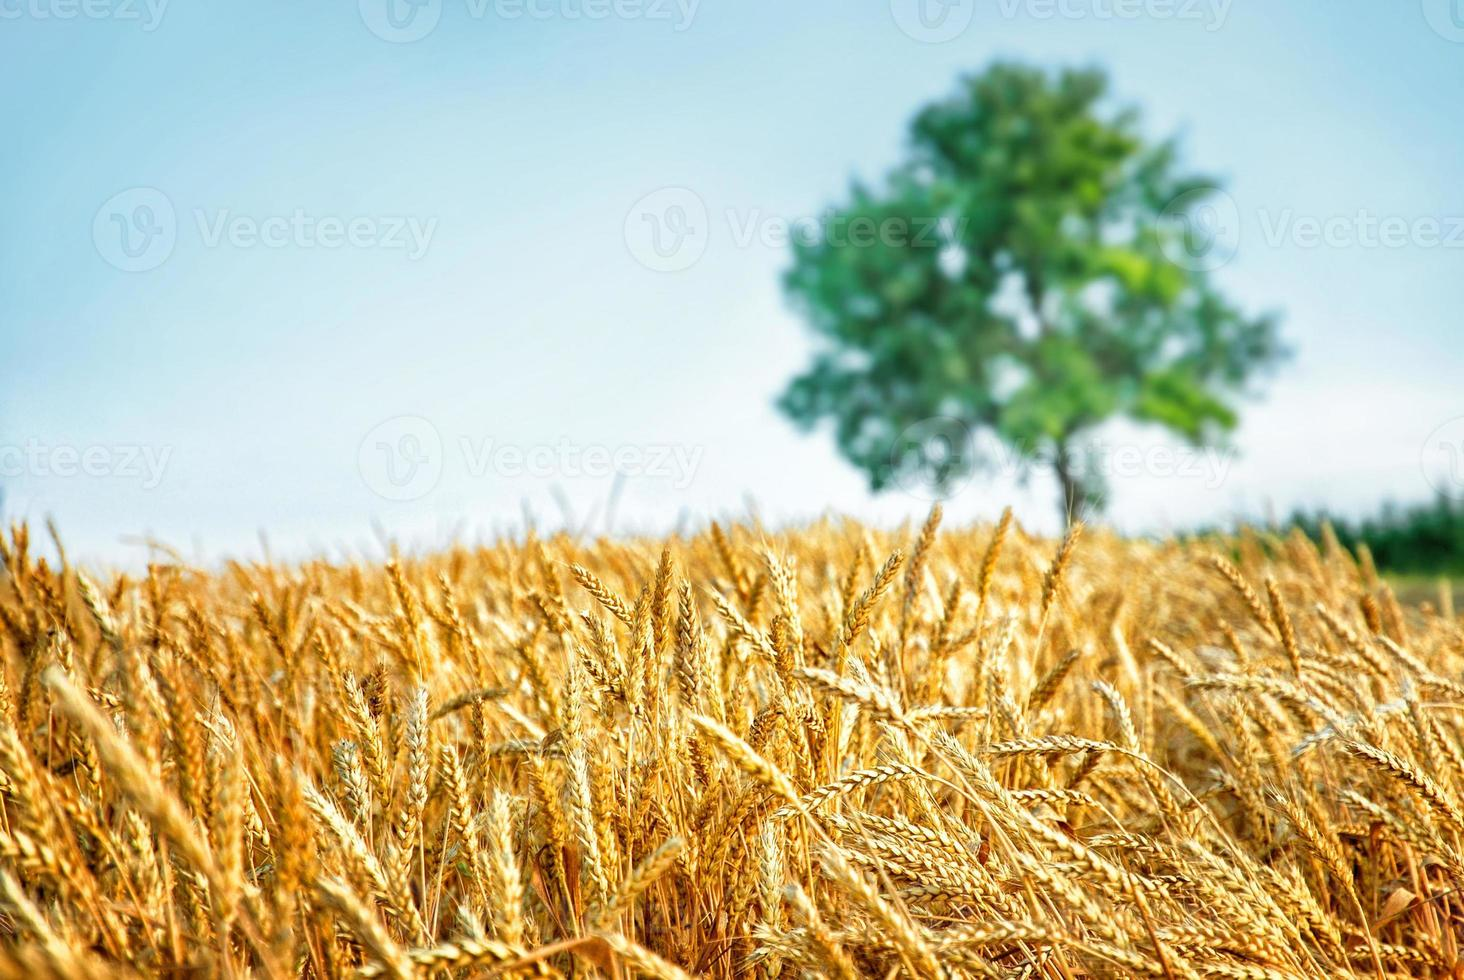 Wheat field and tree photo